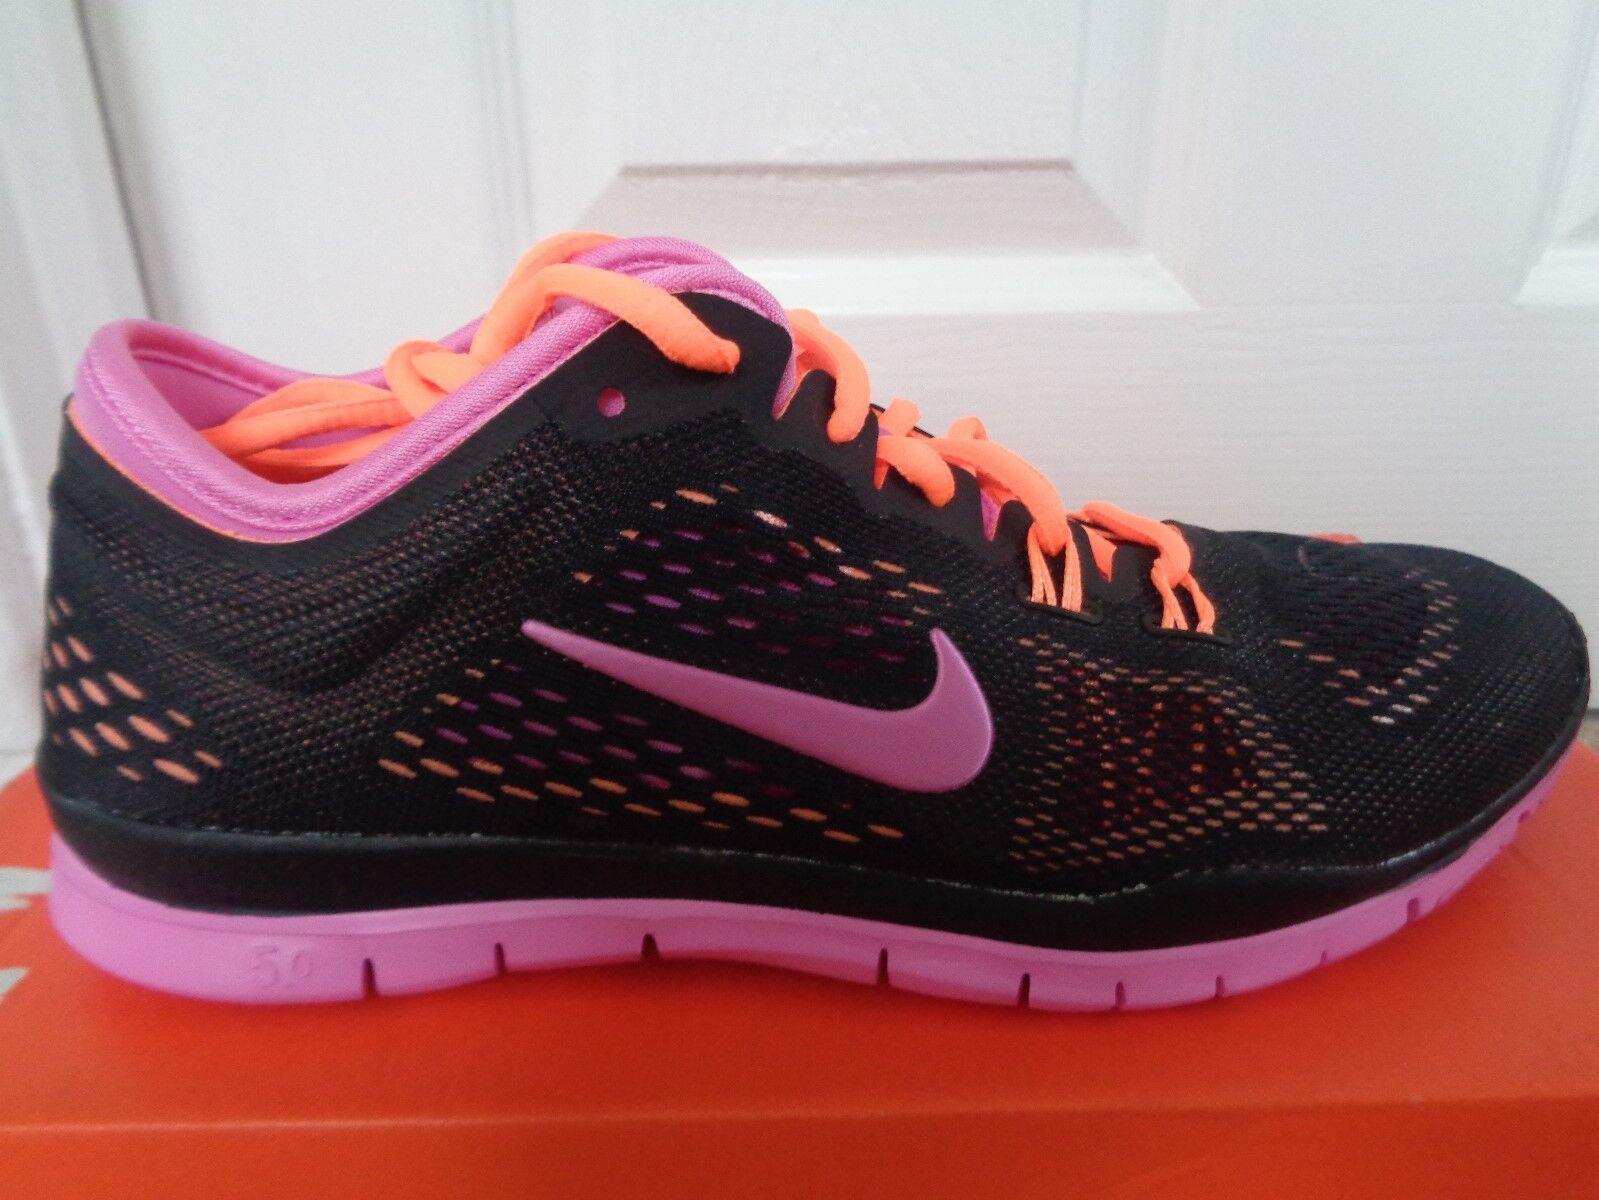 Nike Free 5.0 TR FIT 4 Wmns Scarpe Da Ginnastica 629496 002 UK 3.5 EU 36.5 US 6 Nuovo Scatola